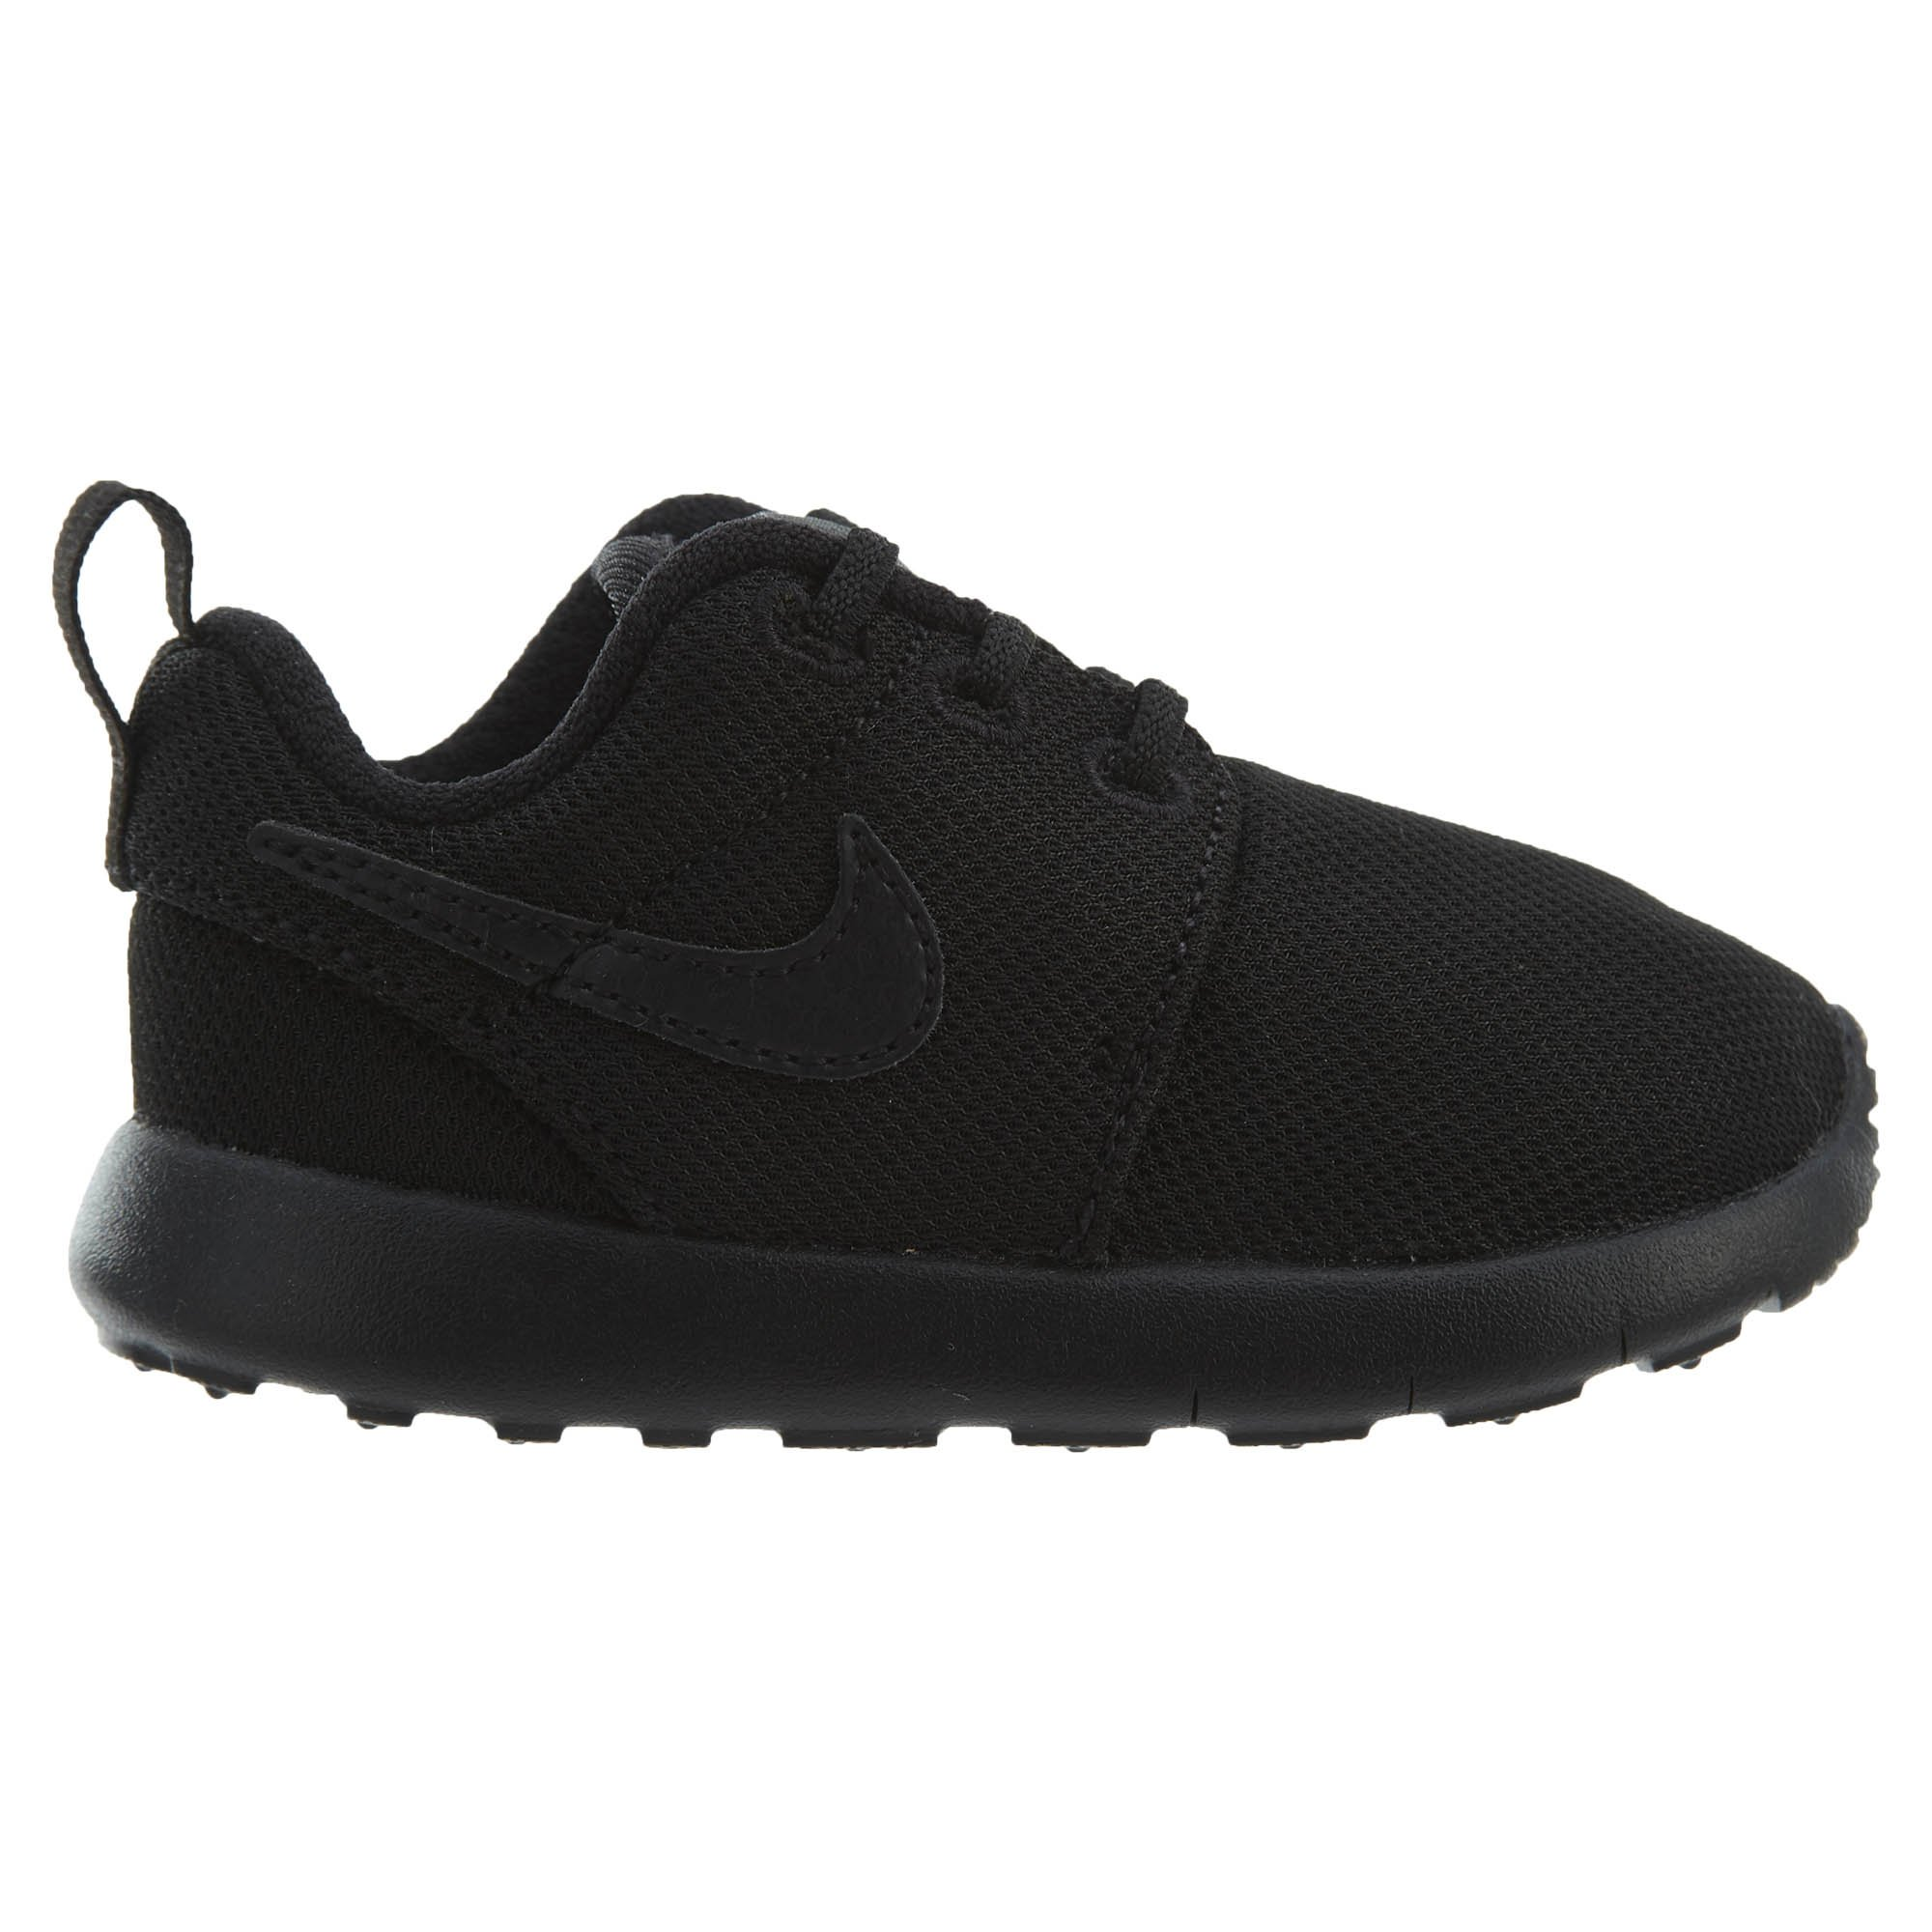 Nike Toddlers' Roshe One (TDV) Black Fabric Running Shoe 6 by Nike (Image #2)